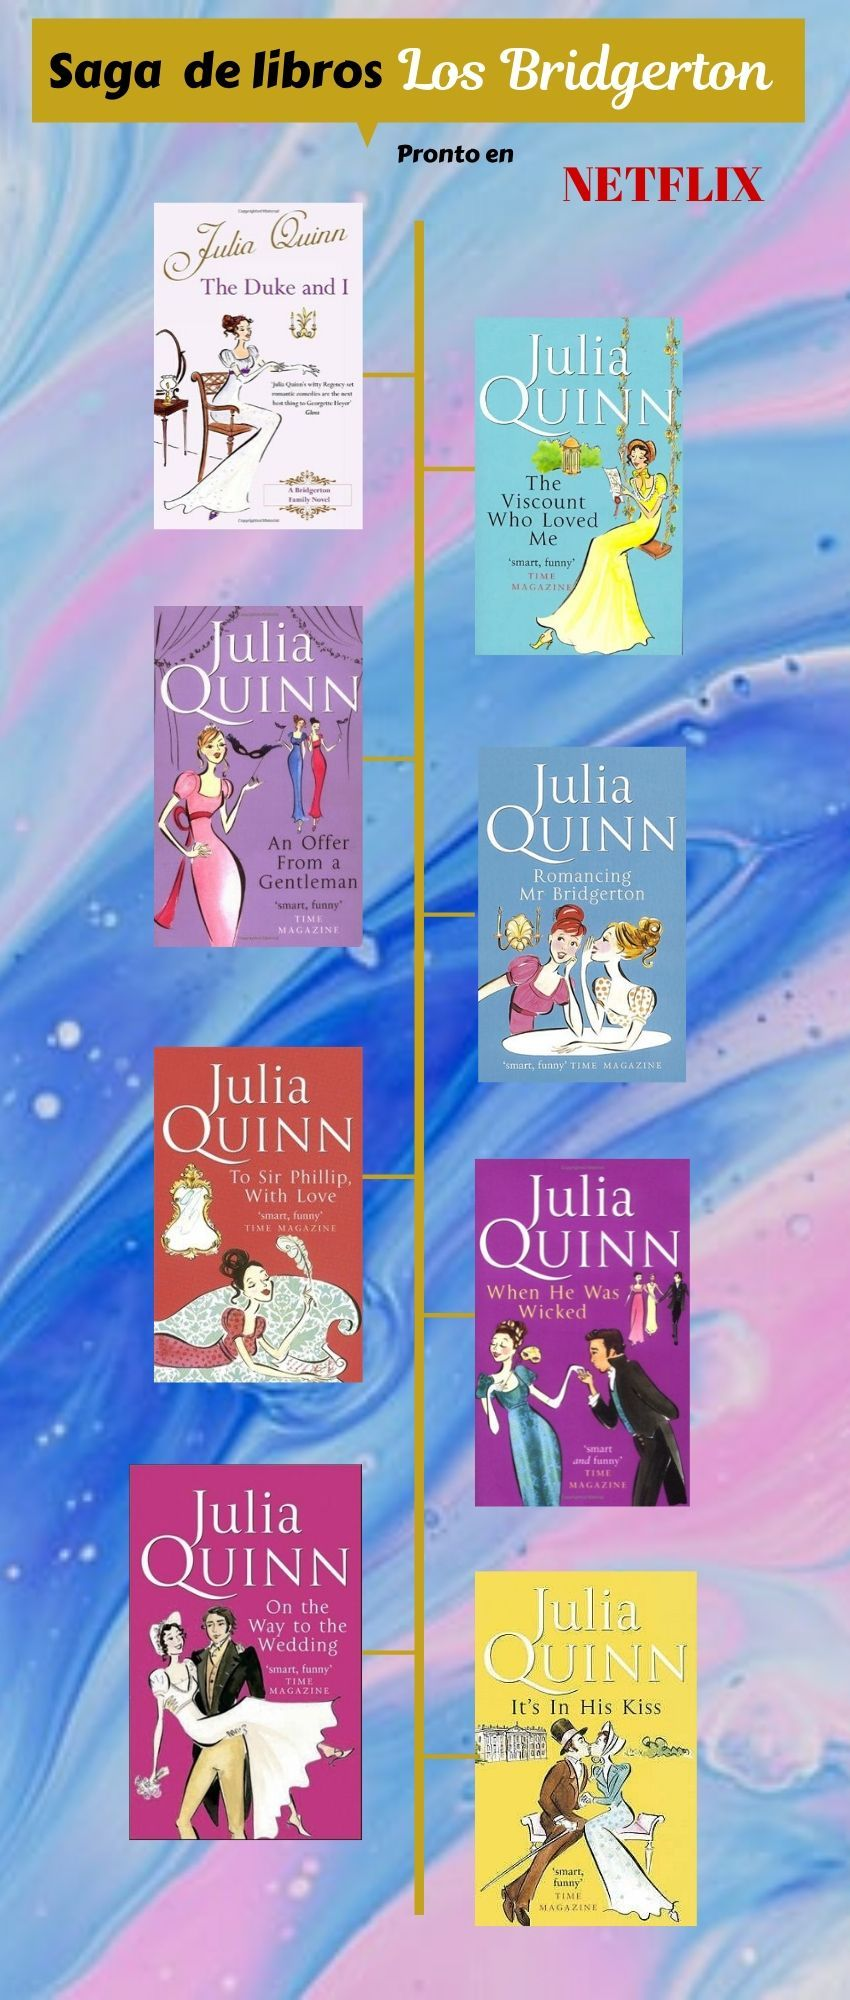 Saga De Libros Los Bridgerton Libros Sagas Libros En Netflix